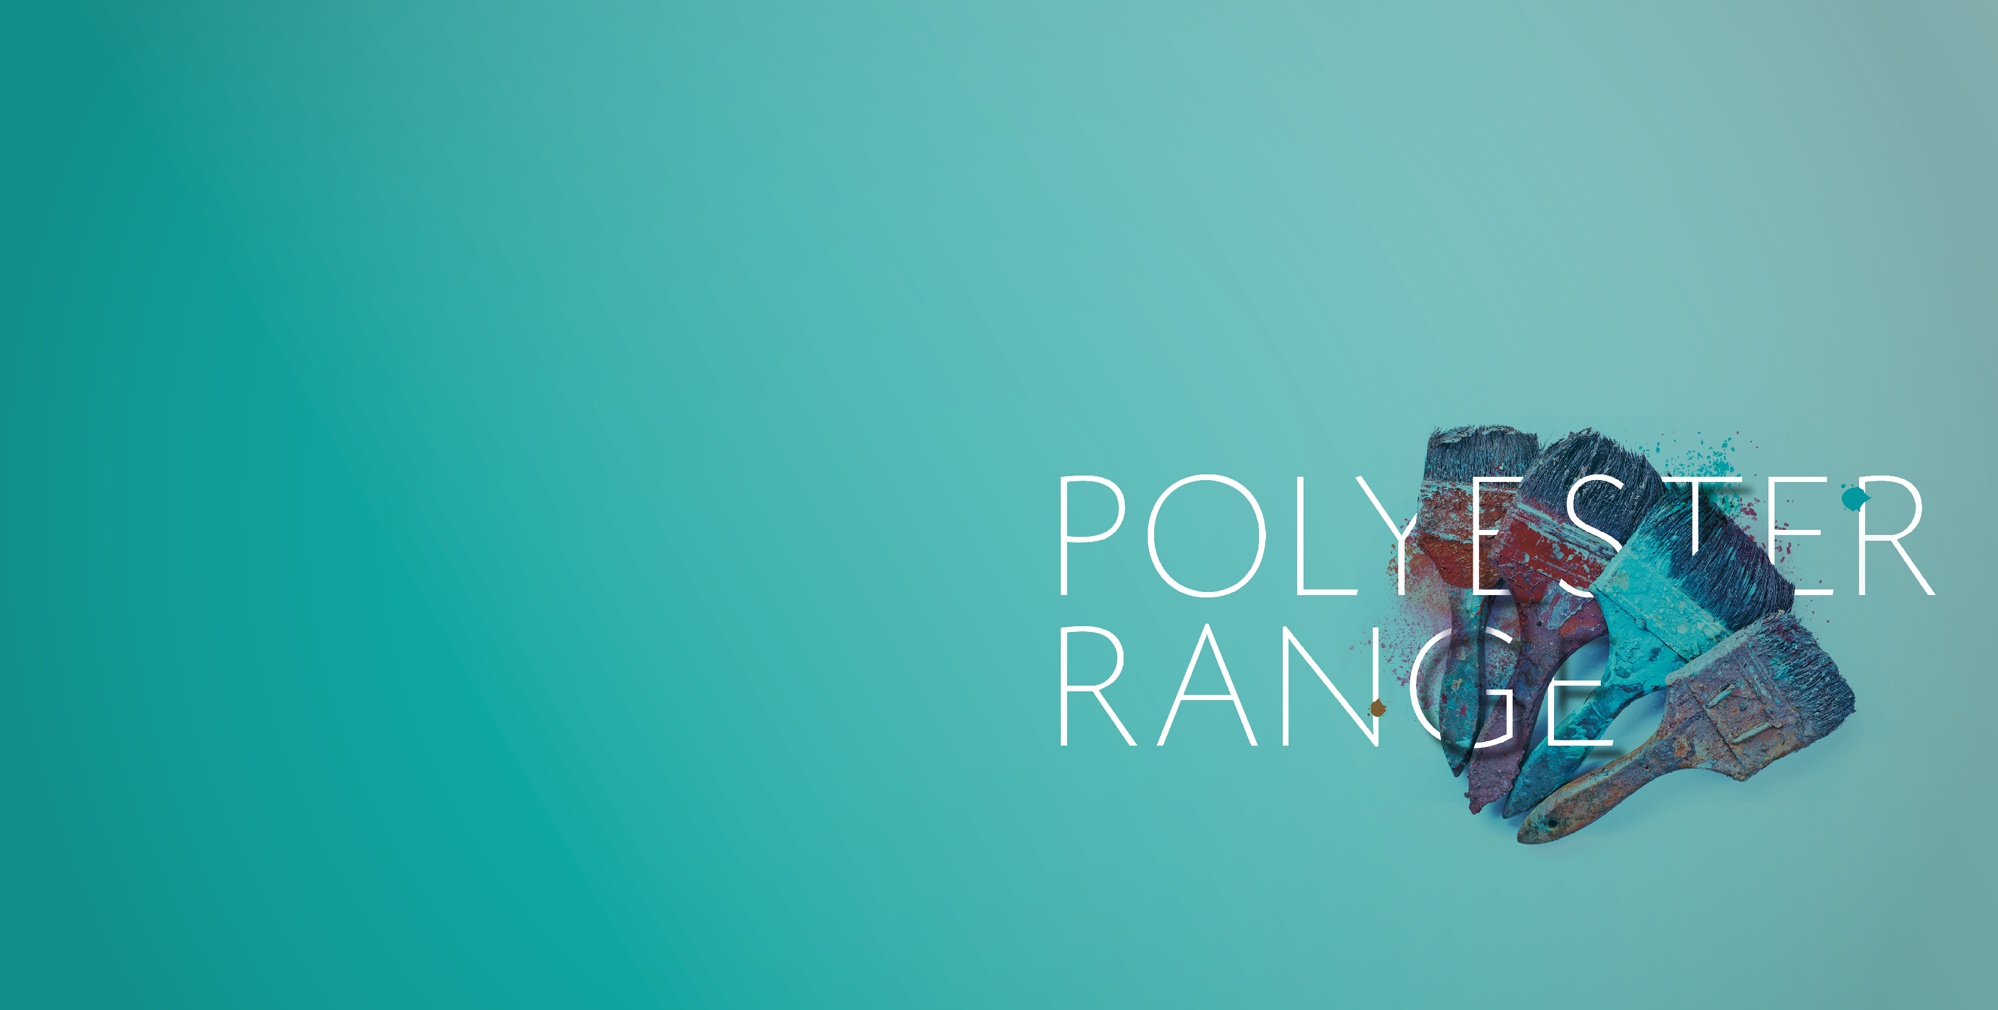 Polyester Range